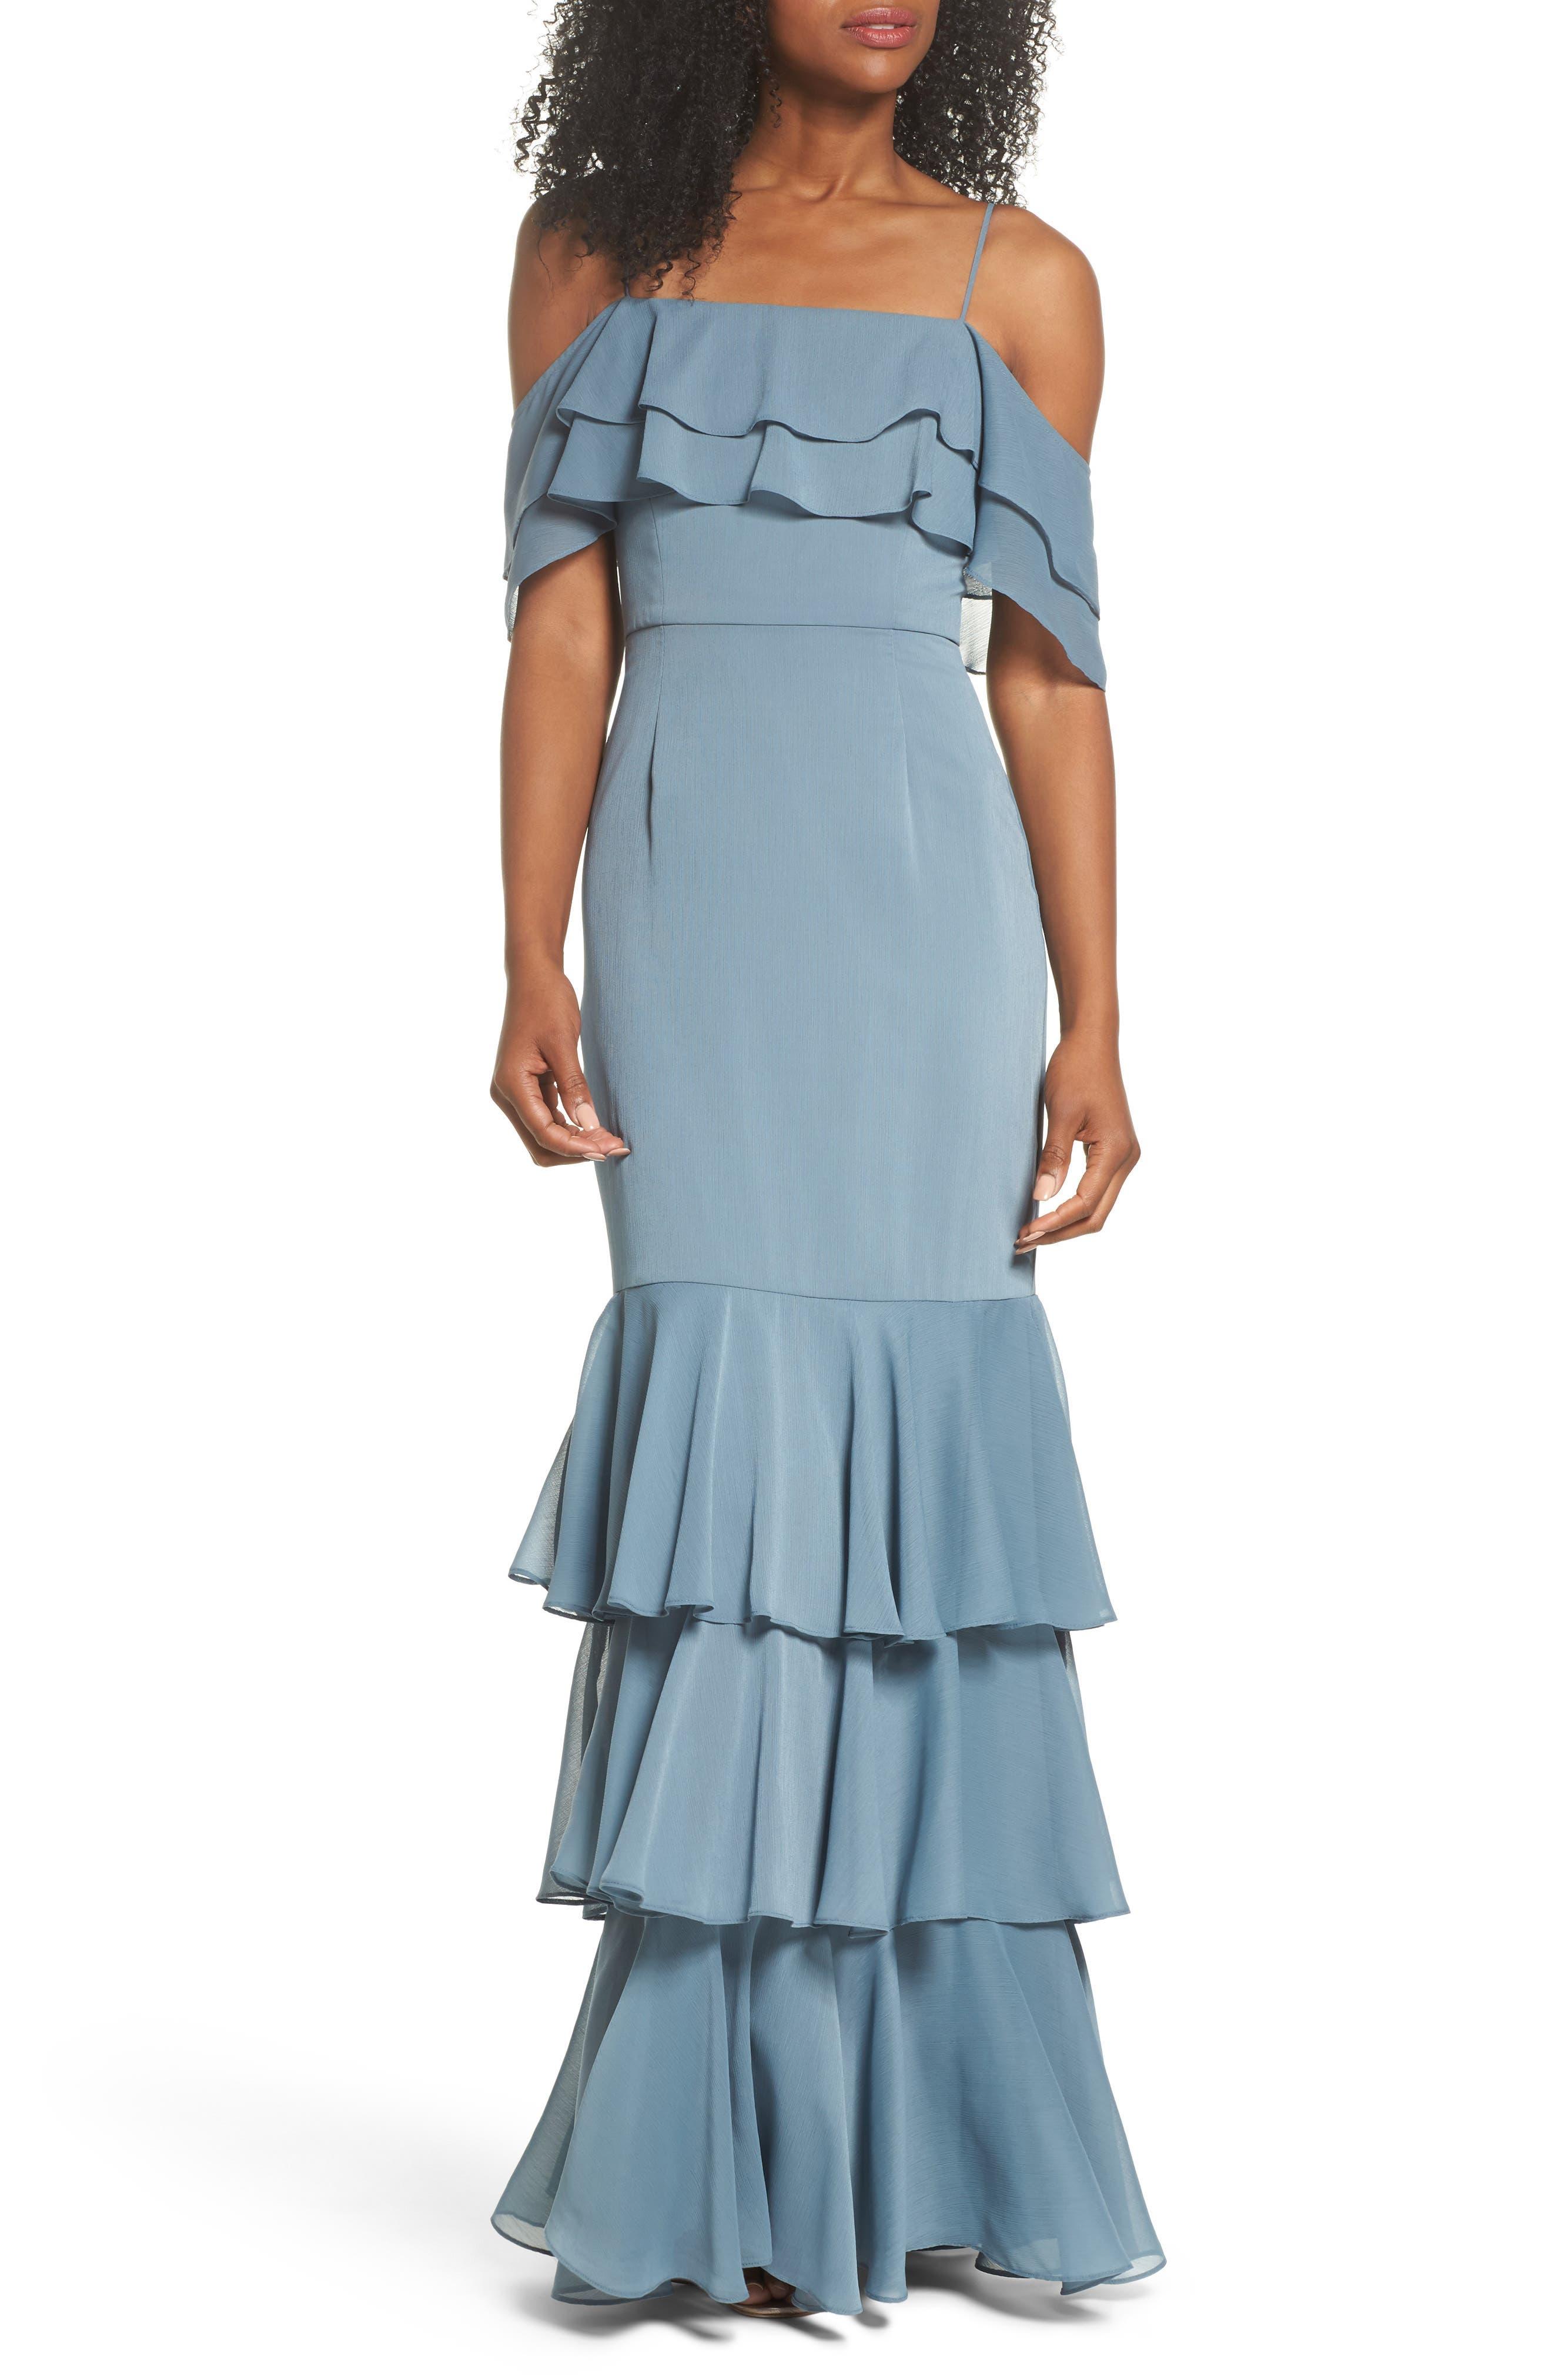 Lauren Cold Shoulder Tiered Gown,                         Main,                         color,